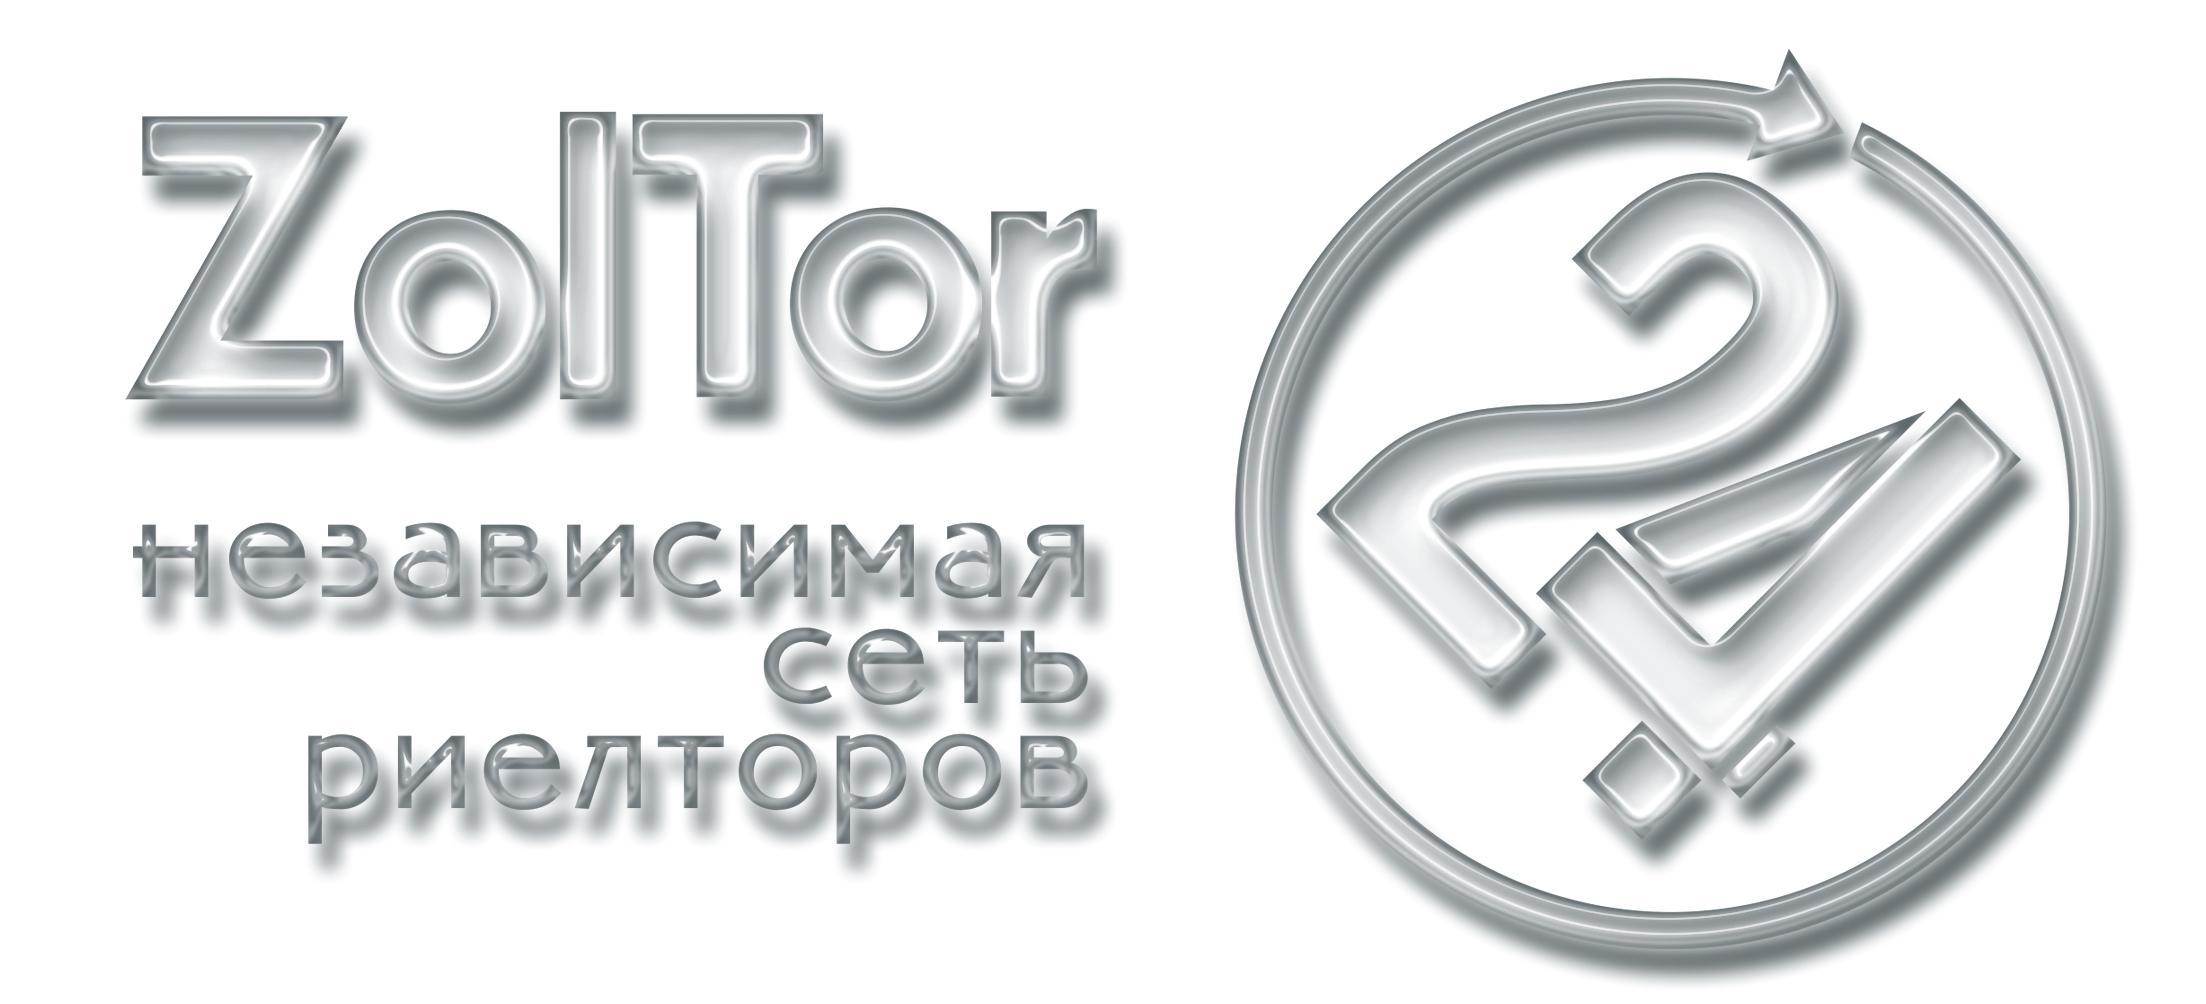 Логотип и фирменный стиль ZolTor24 фото f_1135c8b9662bff84.jpg